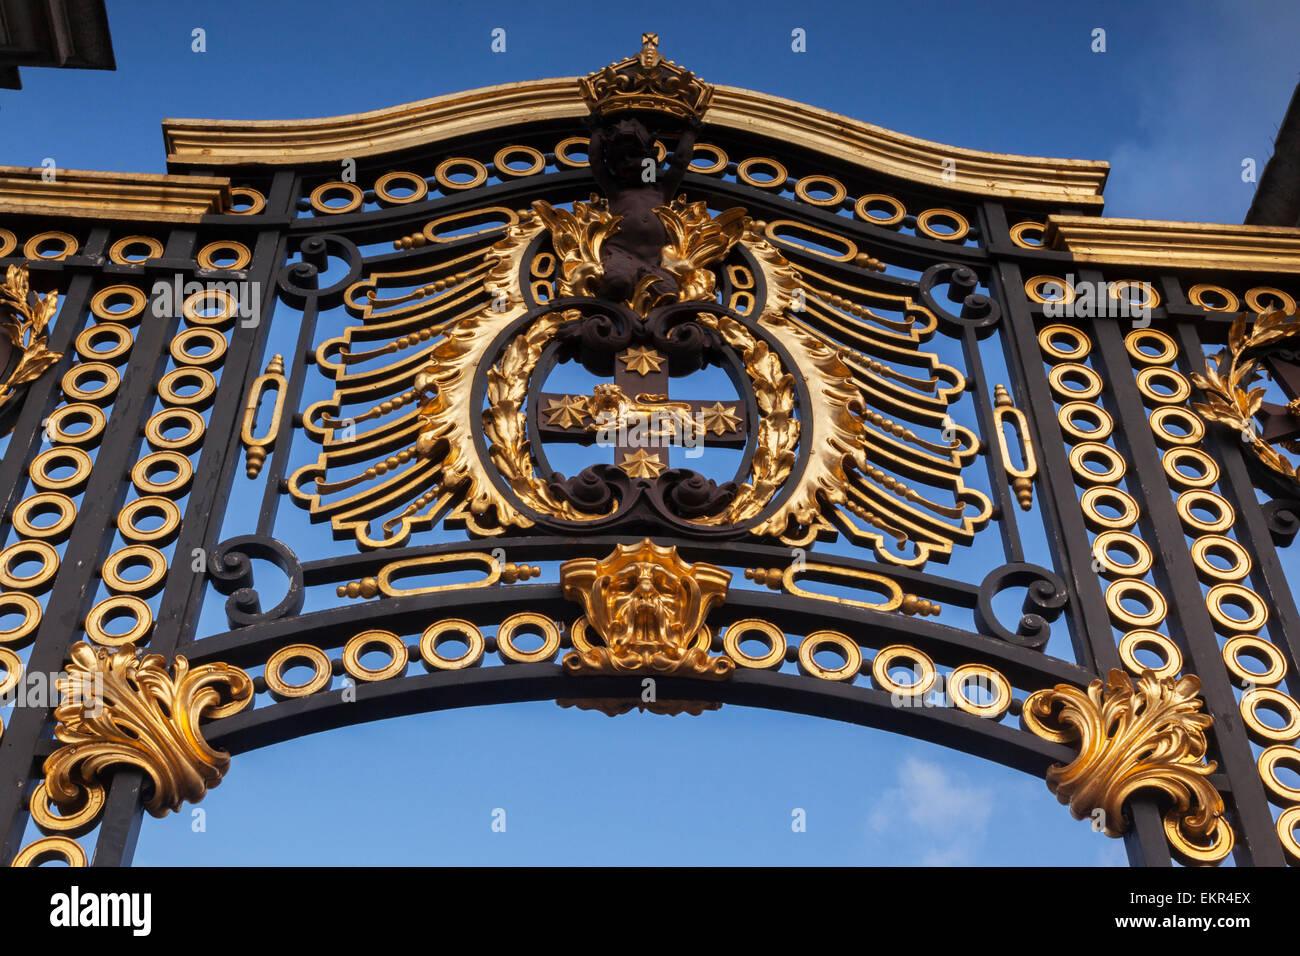 Detail eines Tores aus Gusseisen am Buckingham Palace, London, England. Stockbild